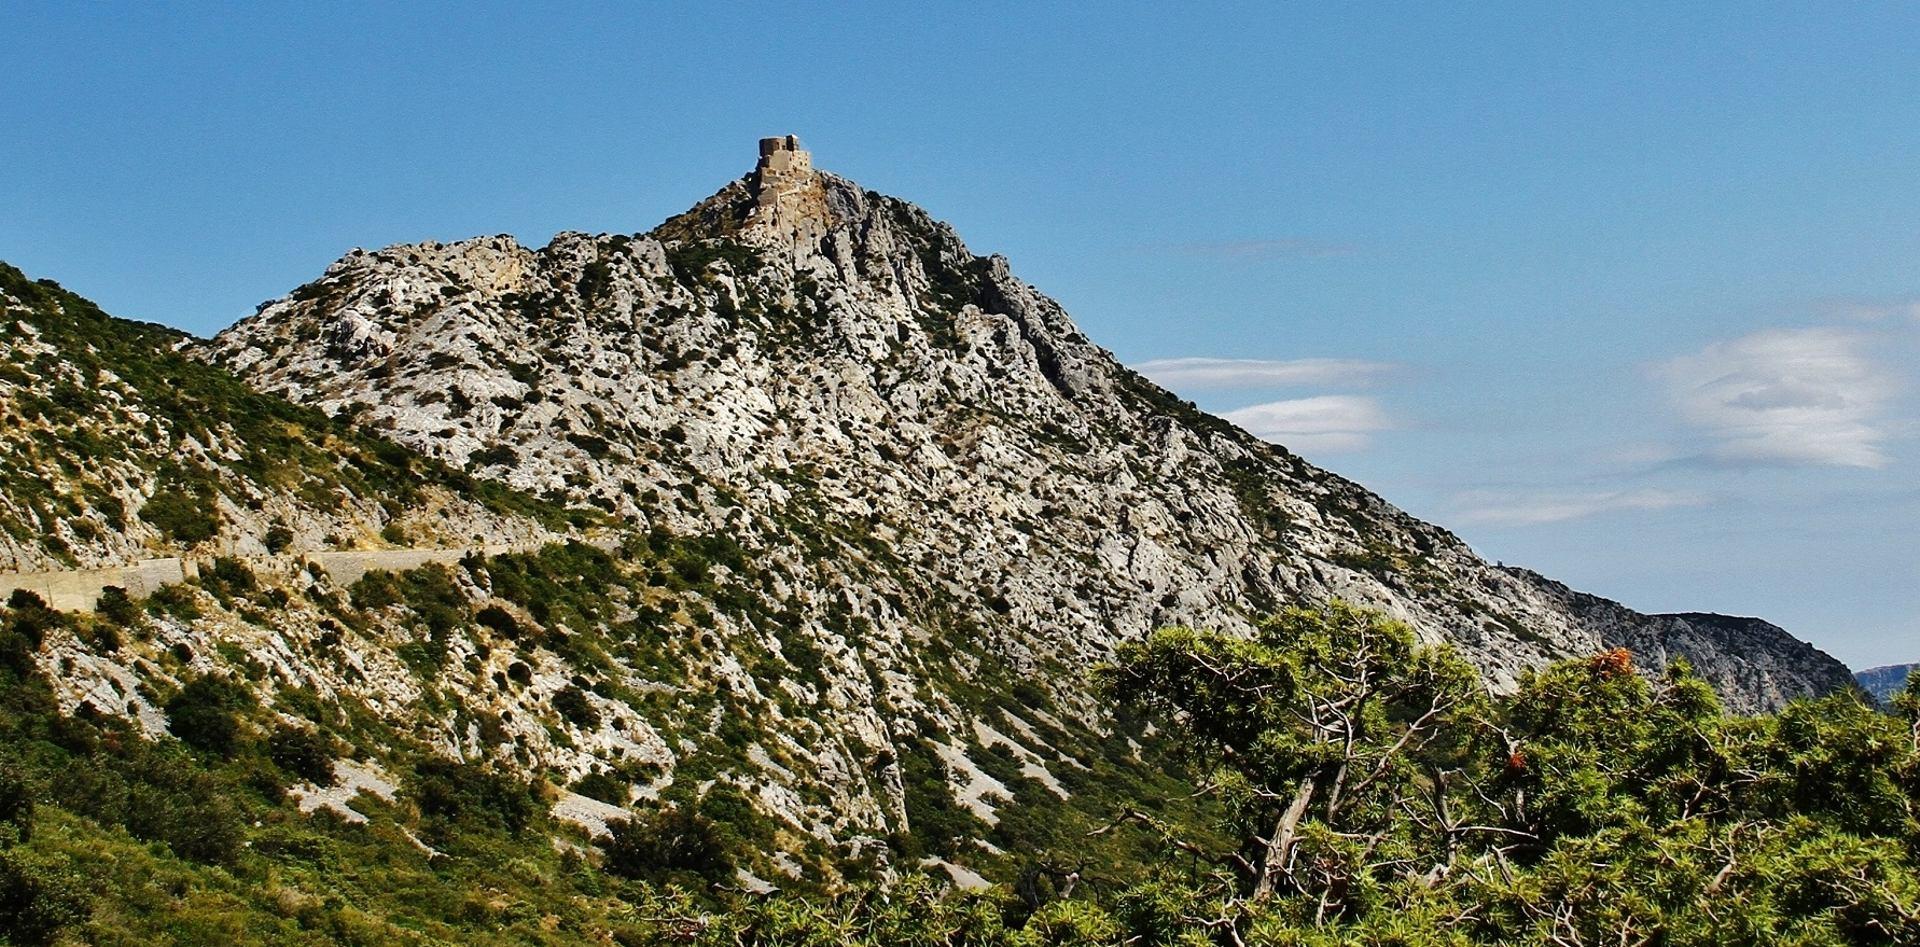 La montagne de Quéribus.